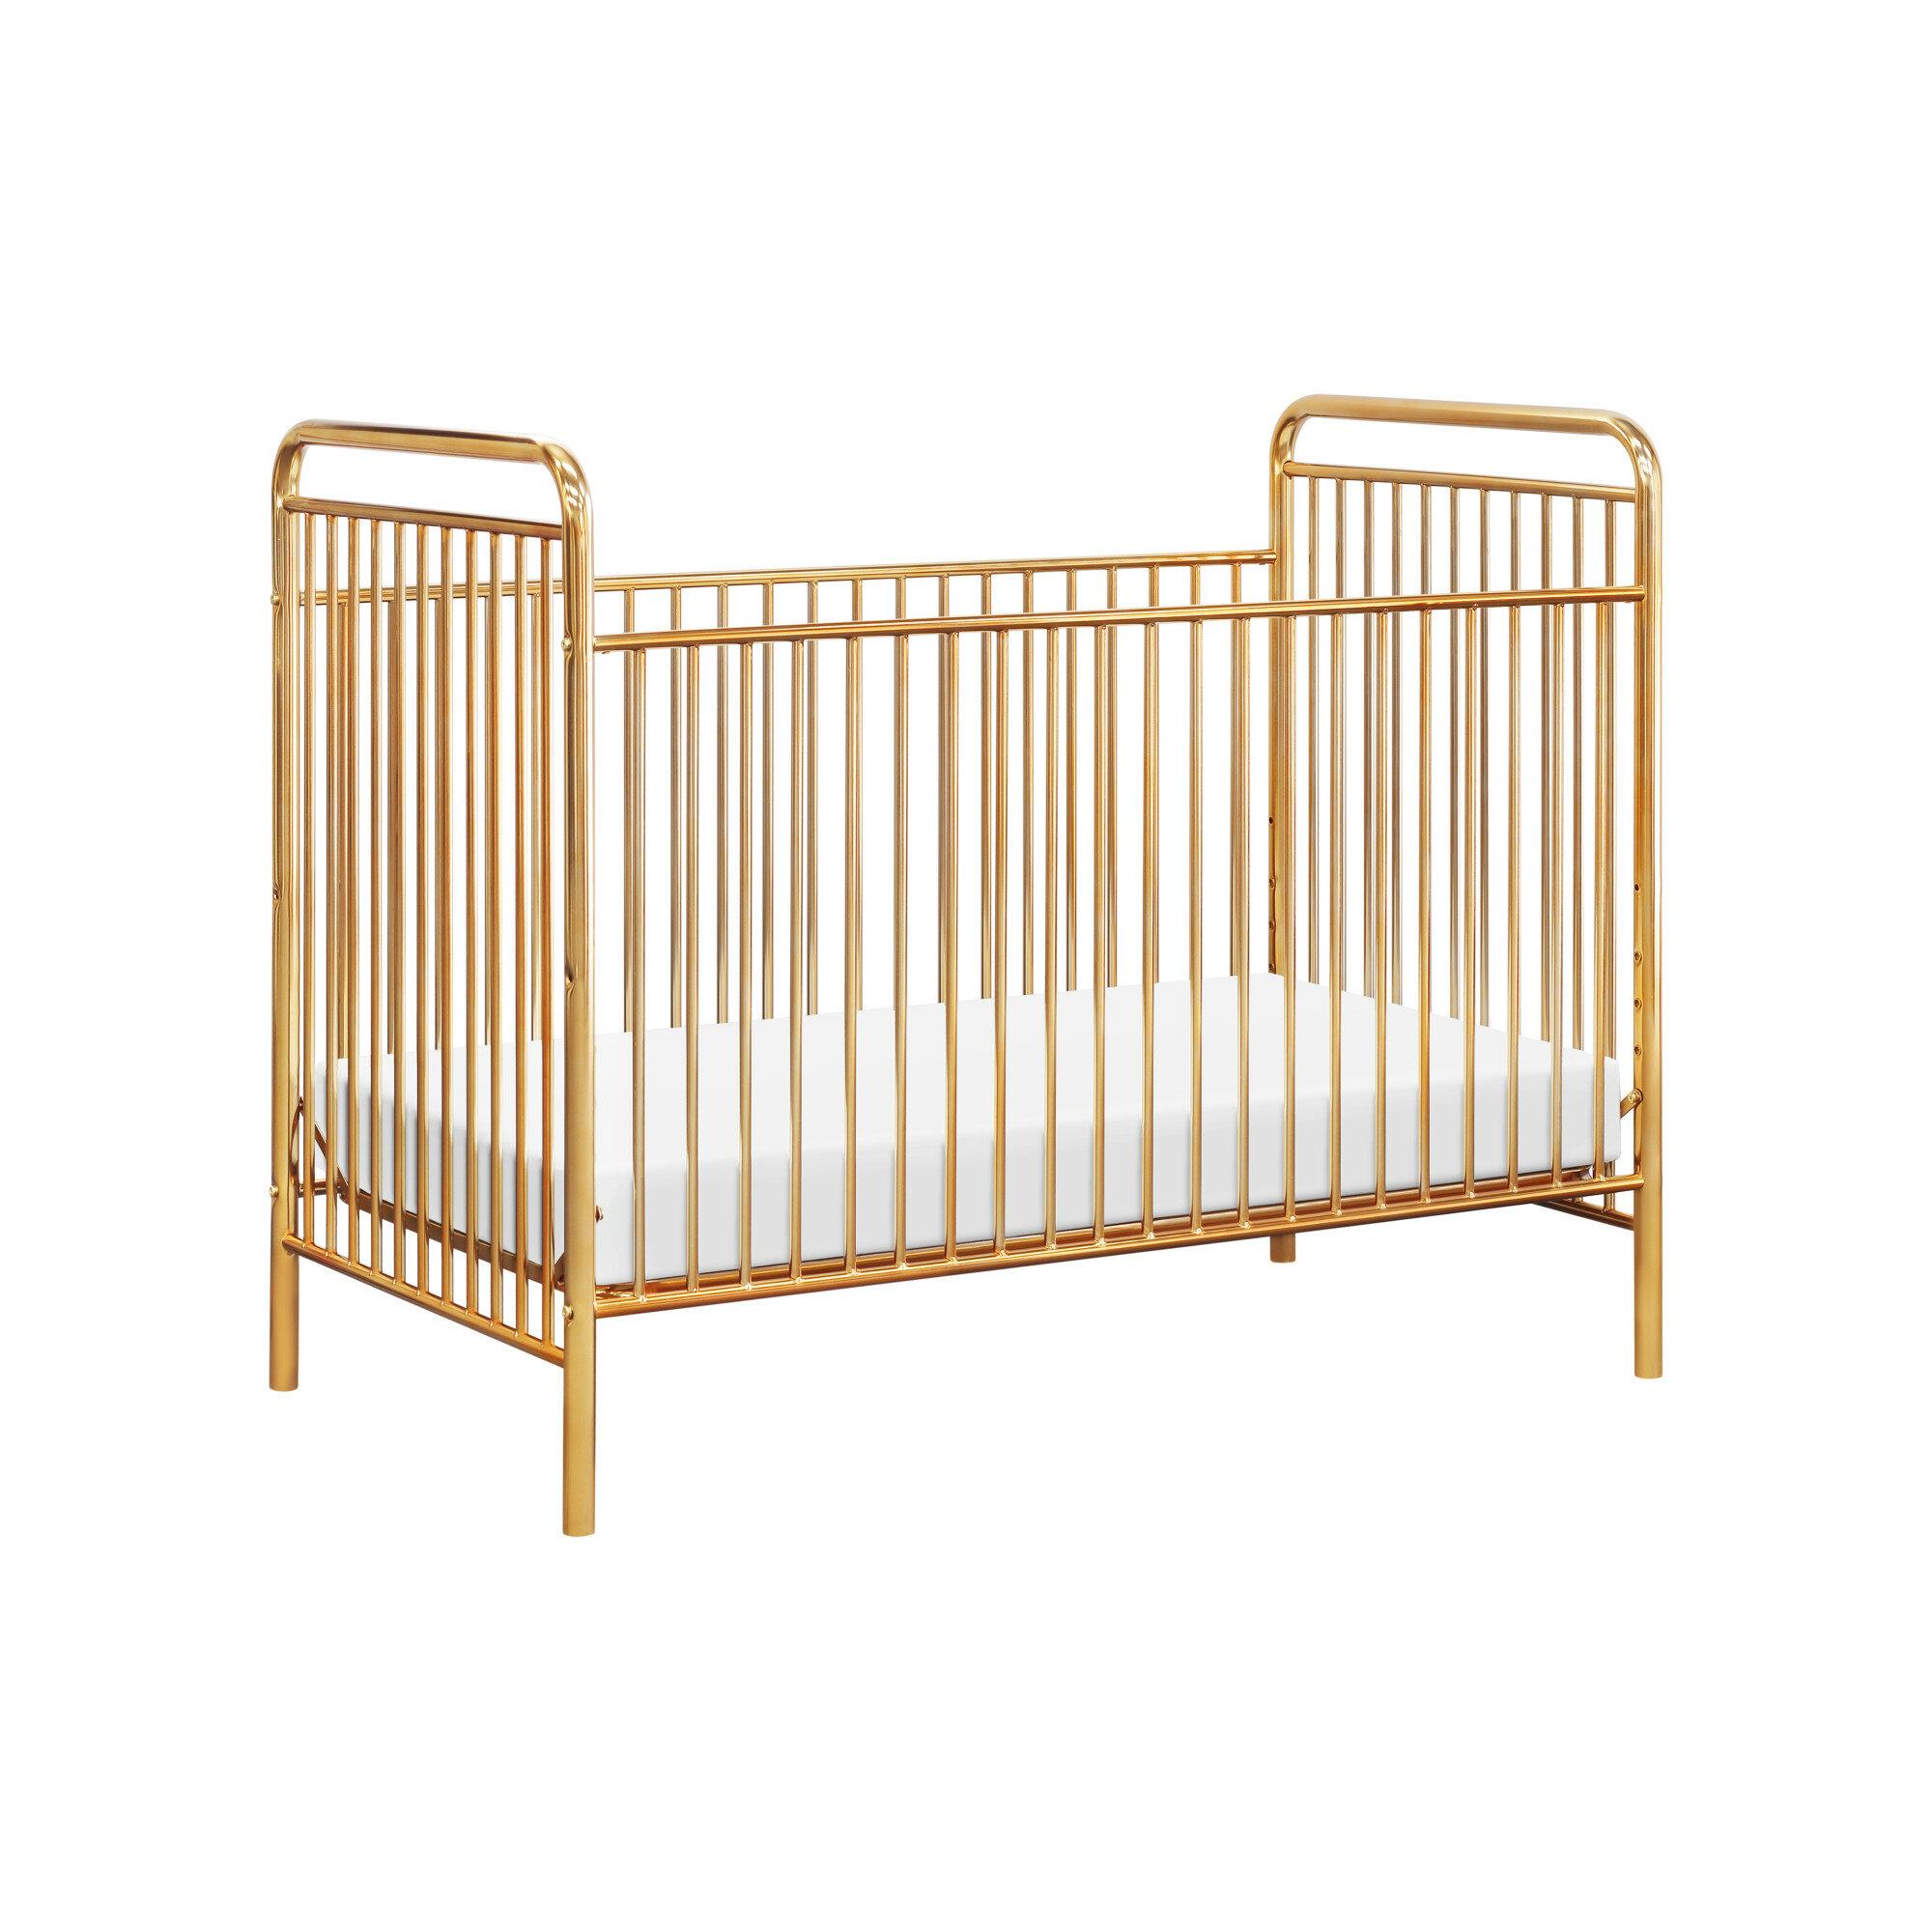 Jubilee Metal 3 In 1 Convertible Crib